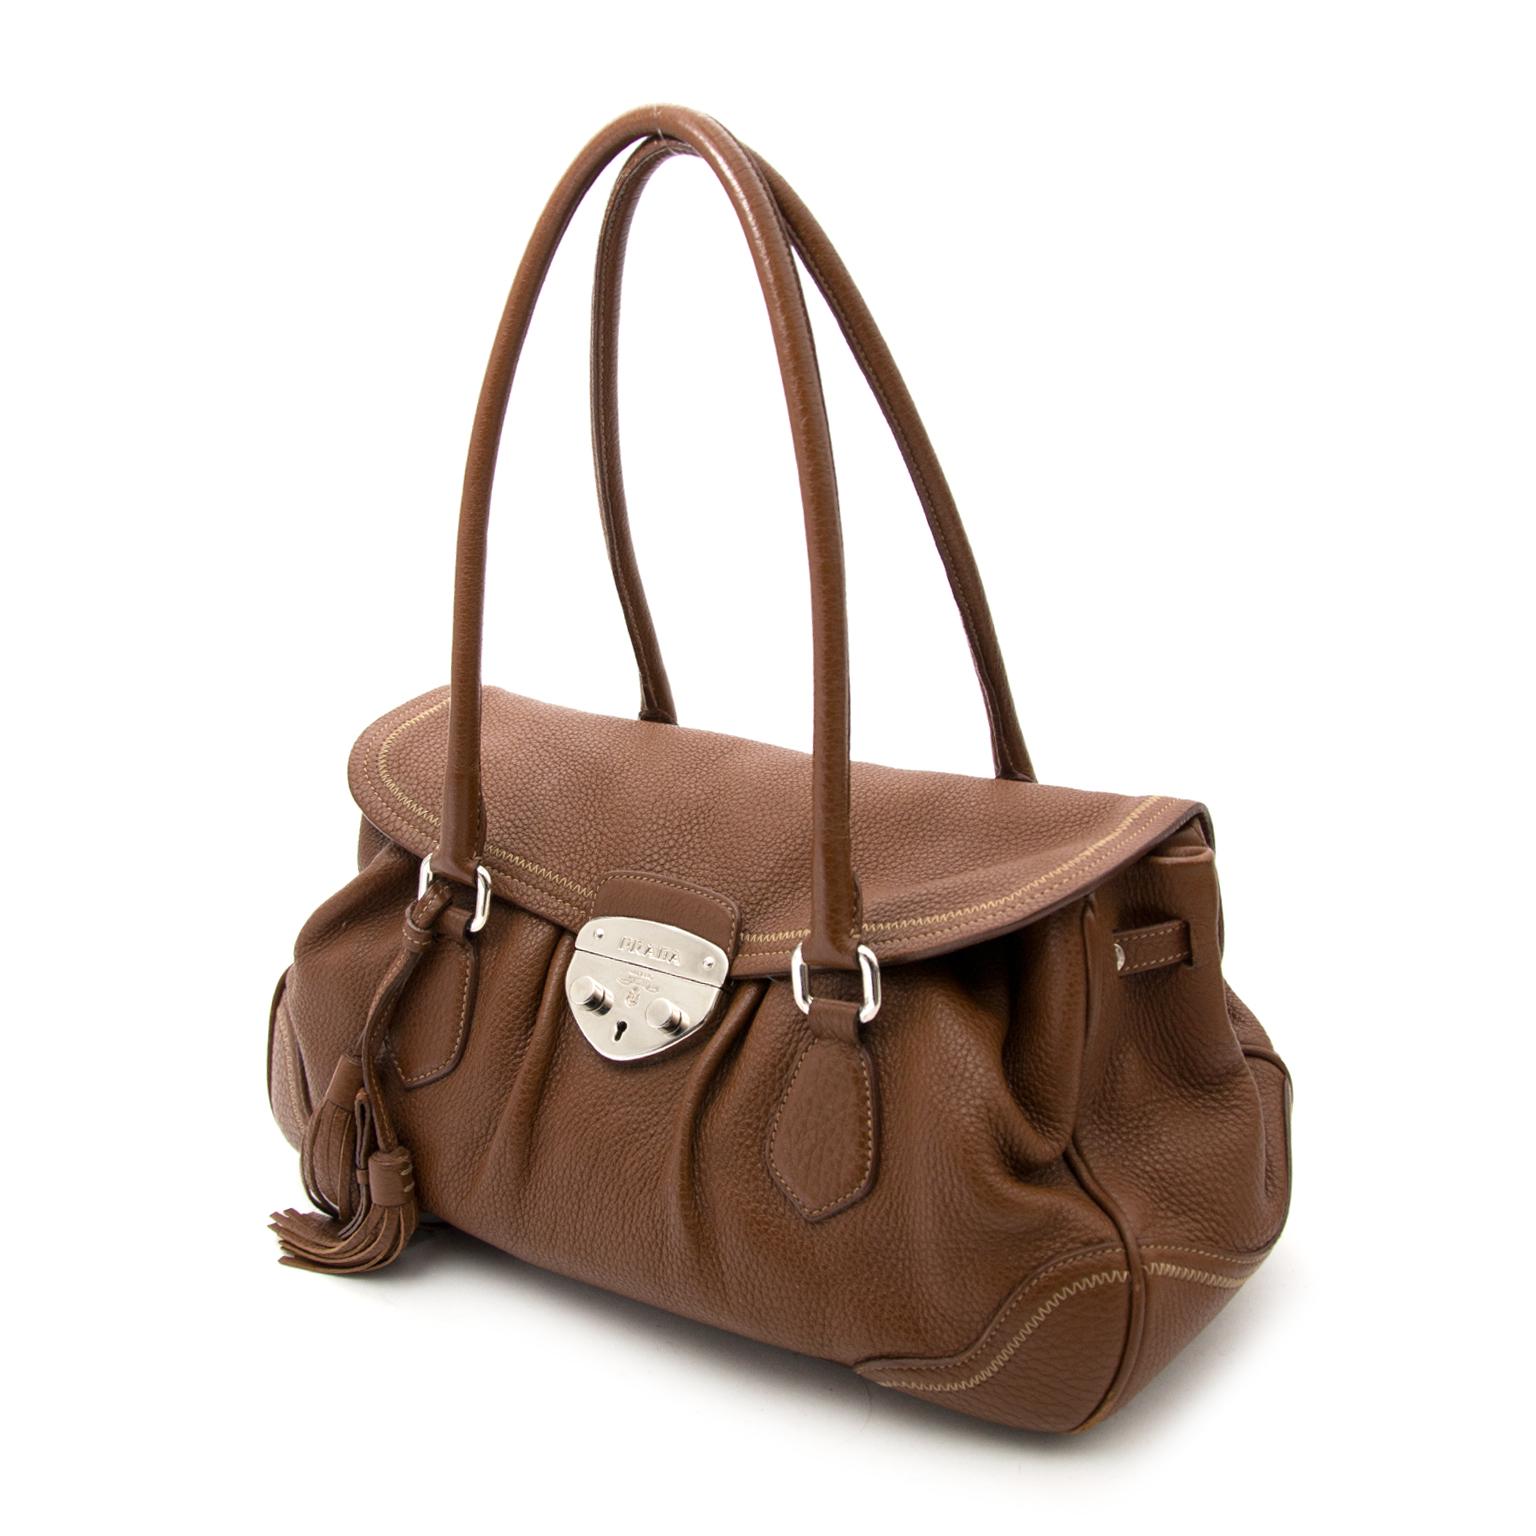 Prada Tabacco Brown Handbag te koop online bij Labellov